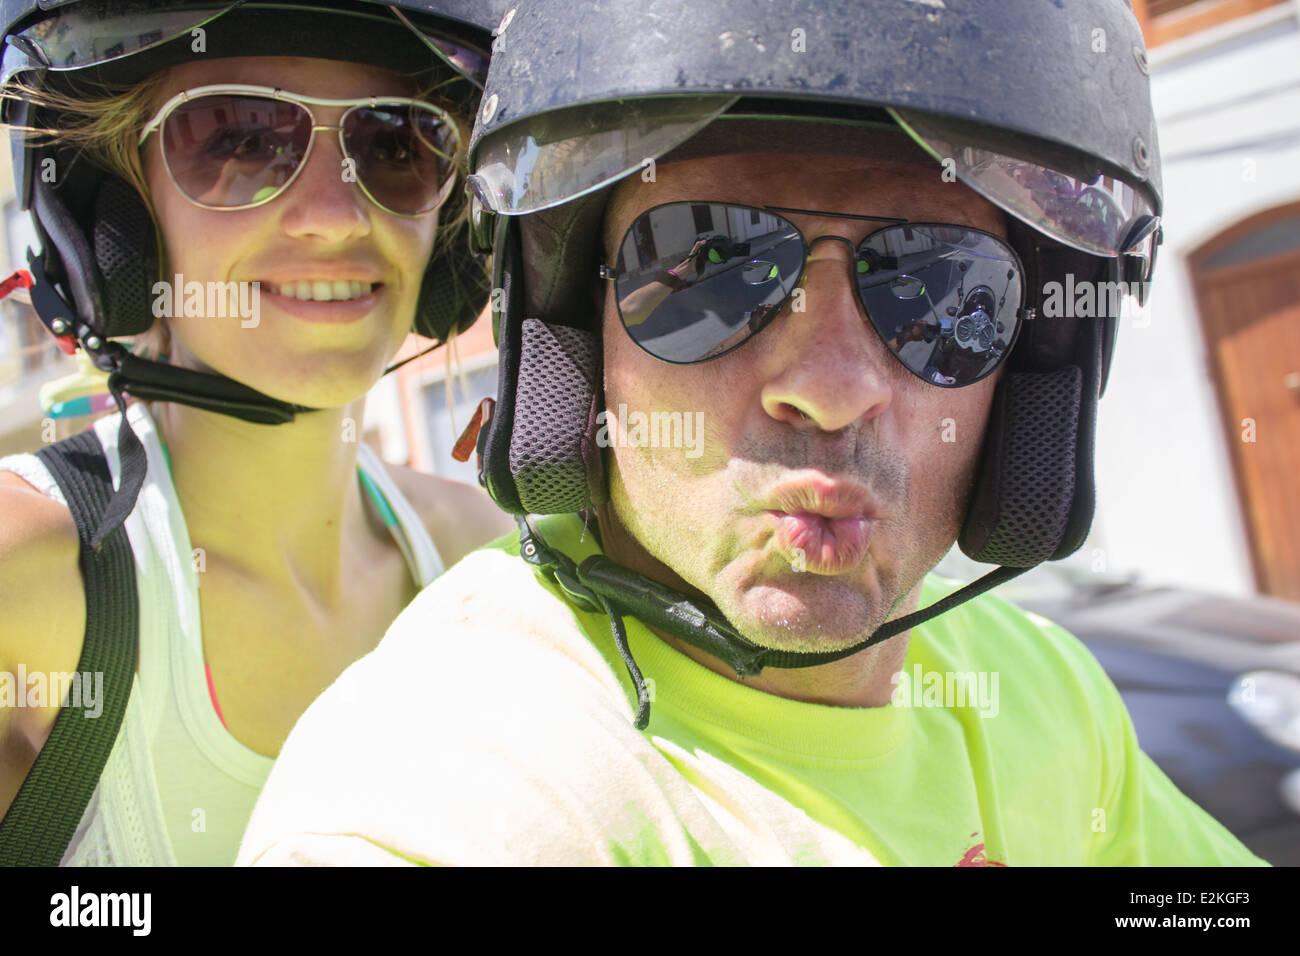 man woman couple helmet helmets sunglasses 'having fun' driving riding smiling smile kiss selfie - Stock Image